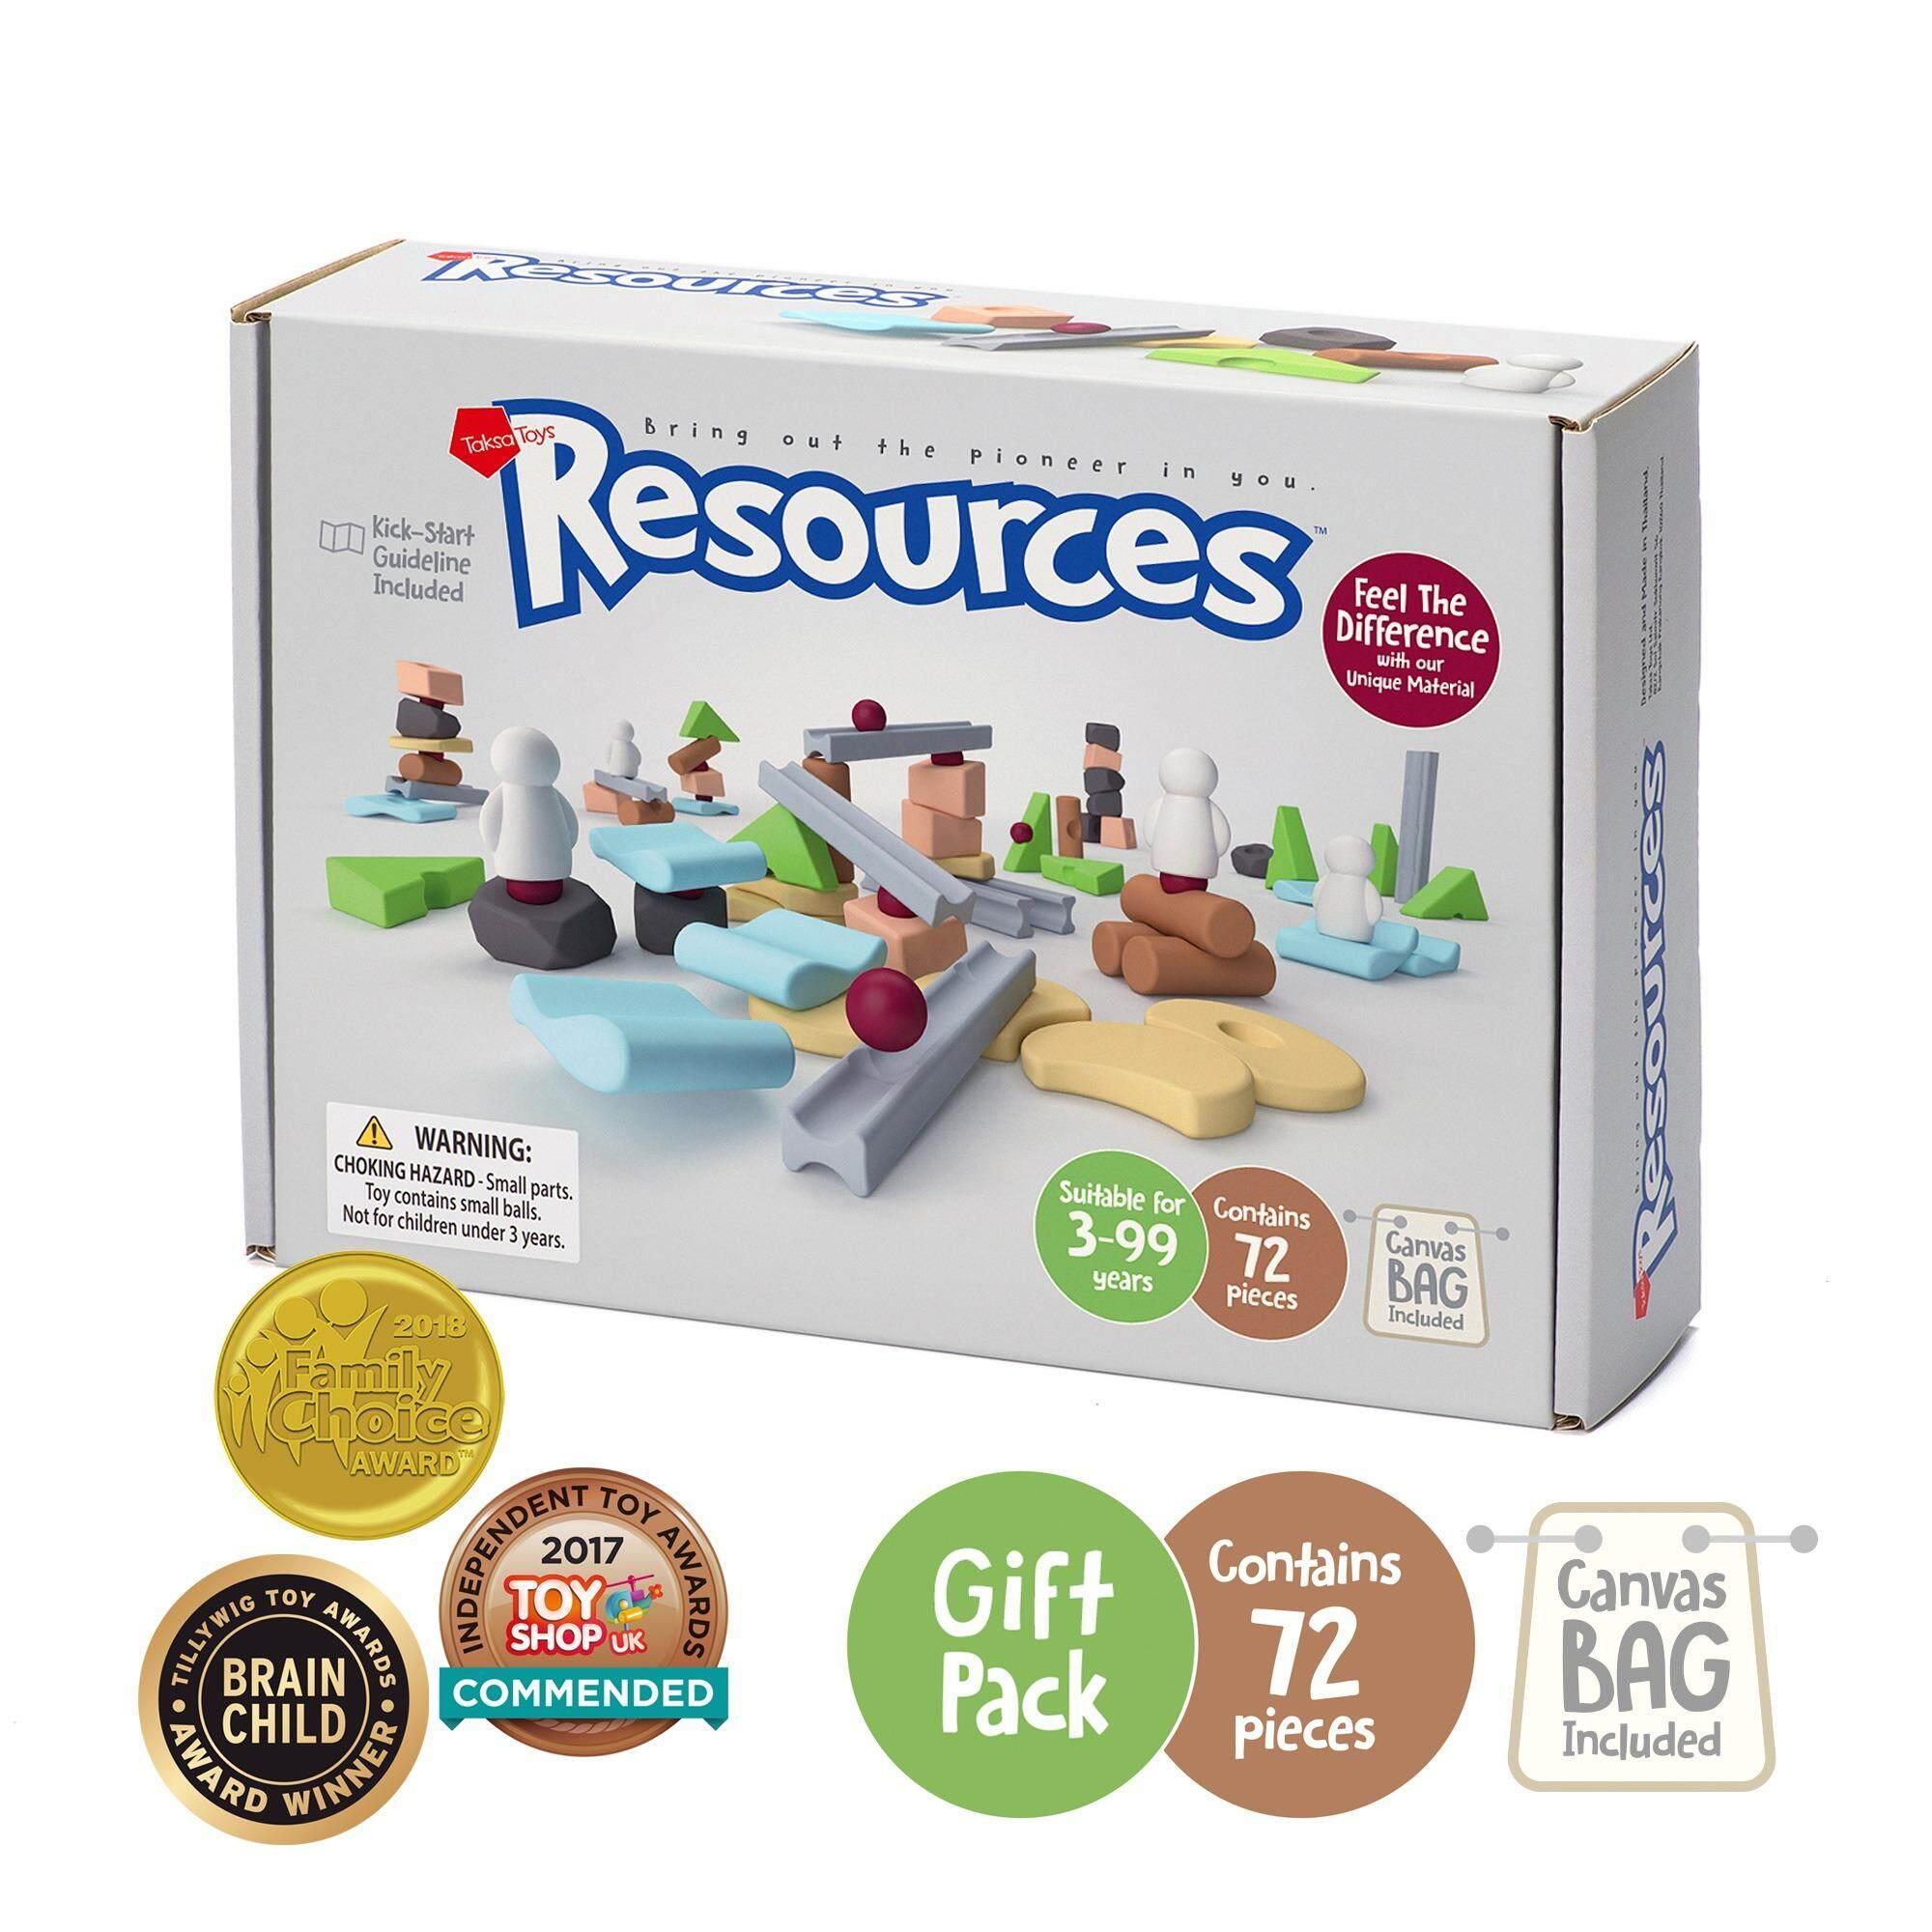 Taksa Toys Resources™ Gift Pack 72 ชิ้น – ของเล่นเสริมพัฒนาการเด็ก / ของเล่นพัฒนาสมอง / ของเล่นตัวต่อ